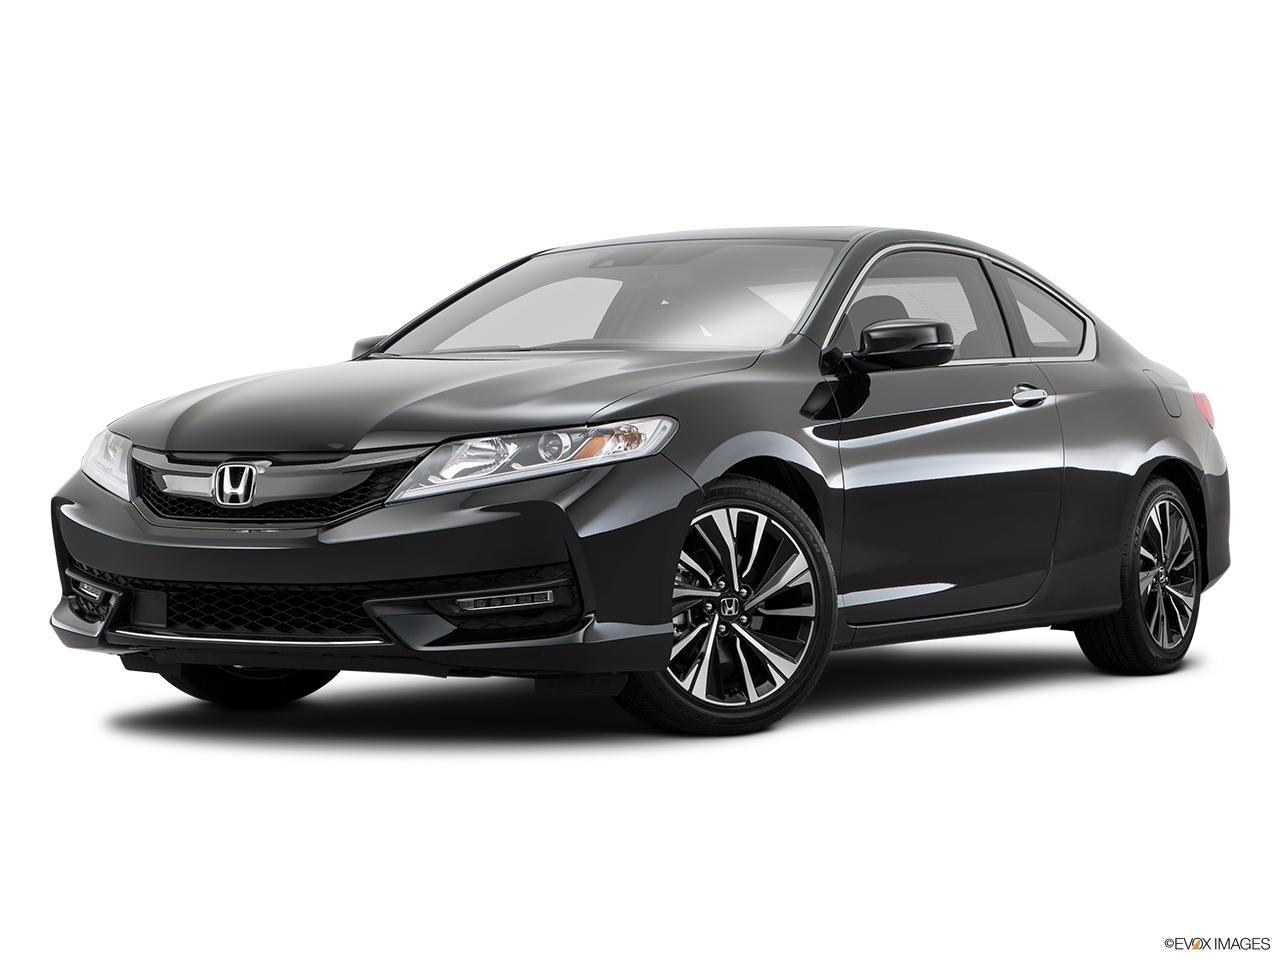 Car pictures list for honda accord 2016 3 5l v6 ex for Honda accord v6 sedan